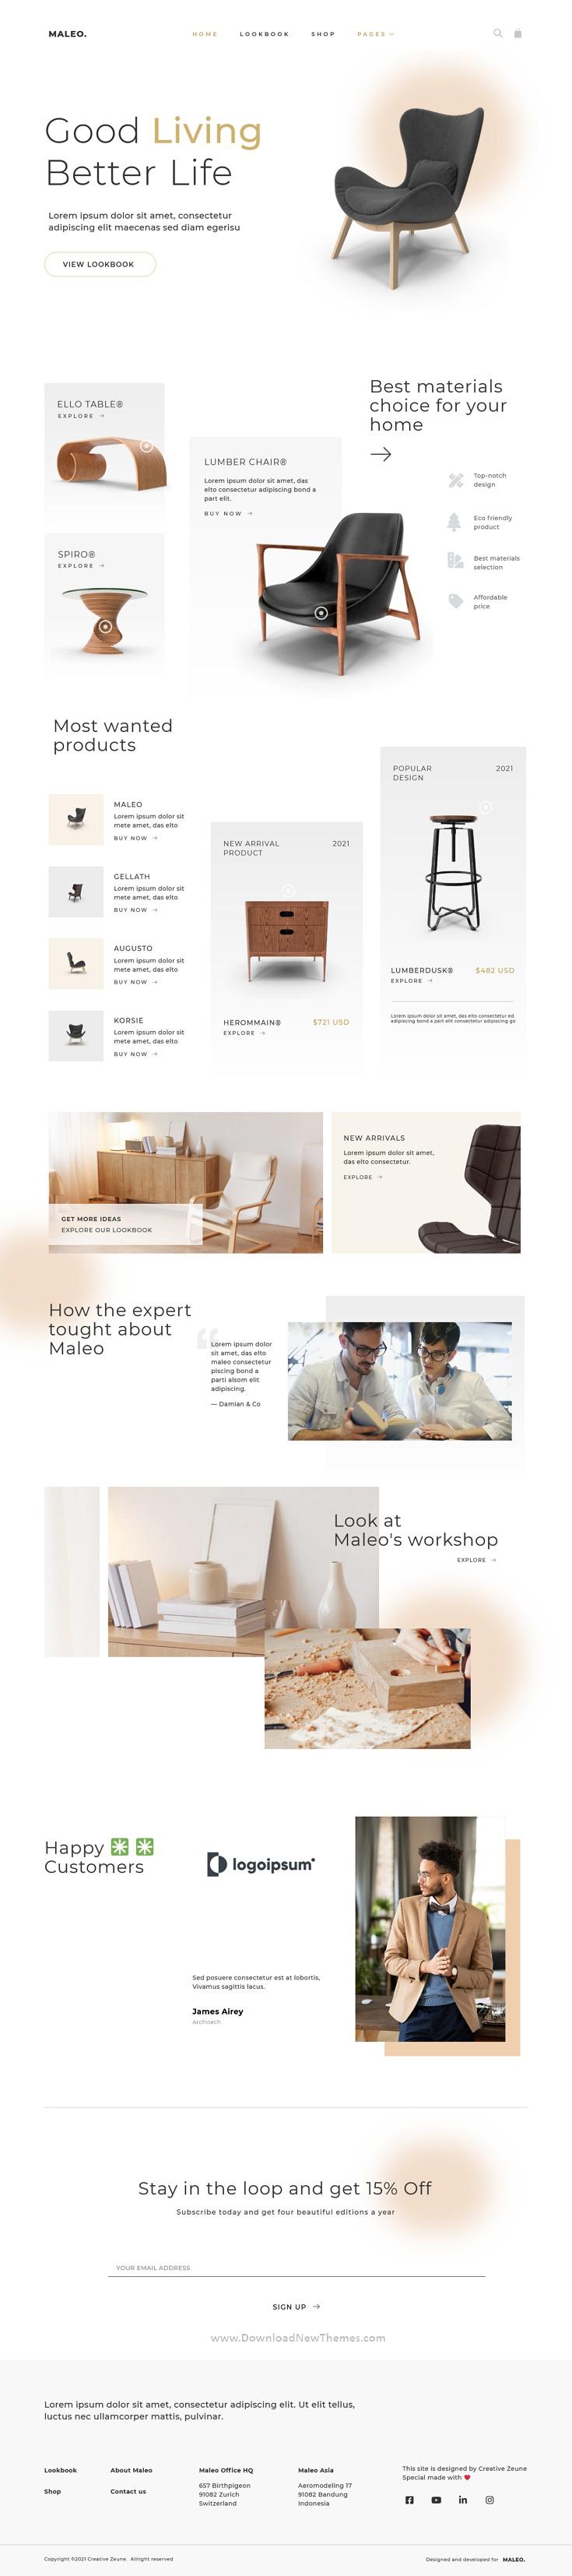 Minimal Home Decor and Furniture Template Kit